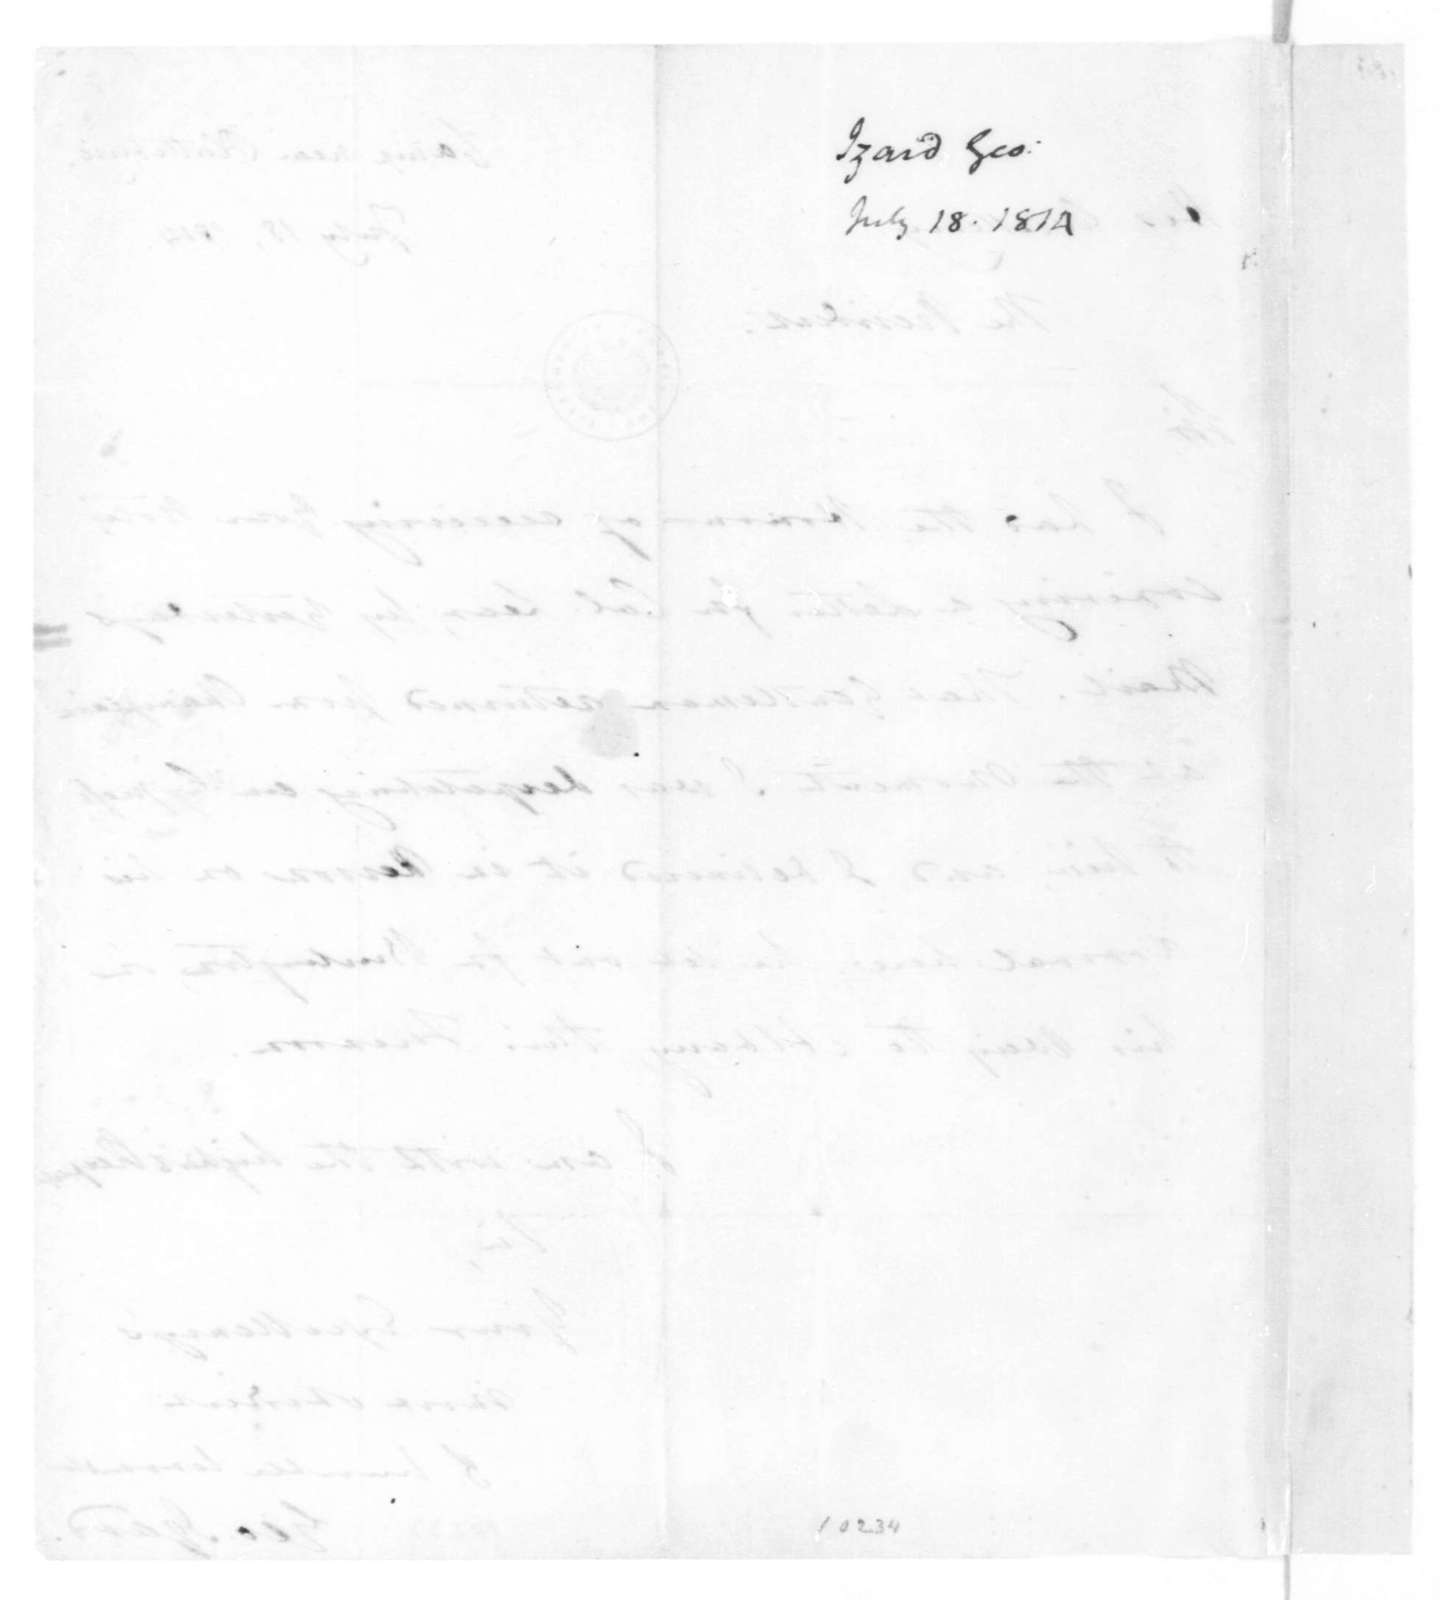 George Izard to James Madison, July 18, 1814.